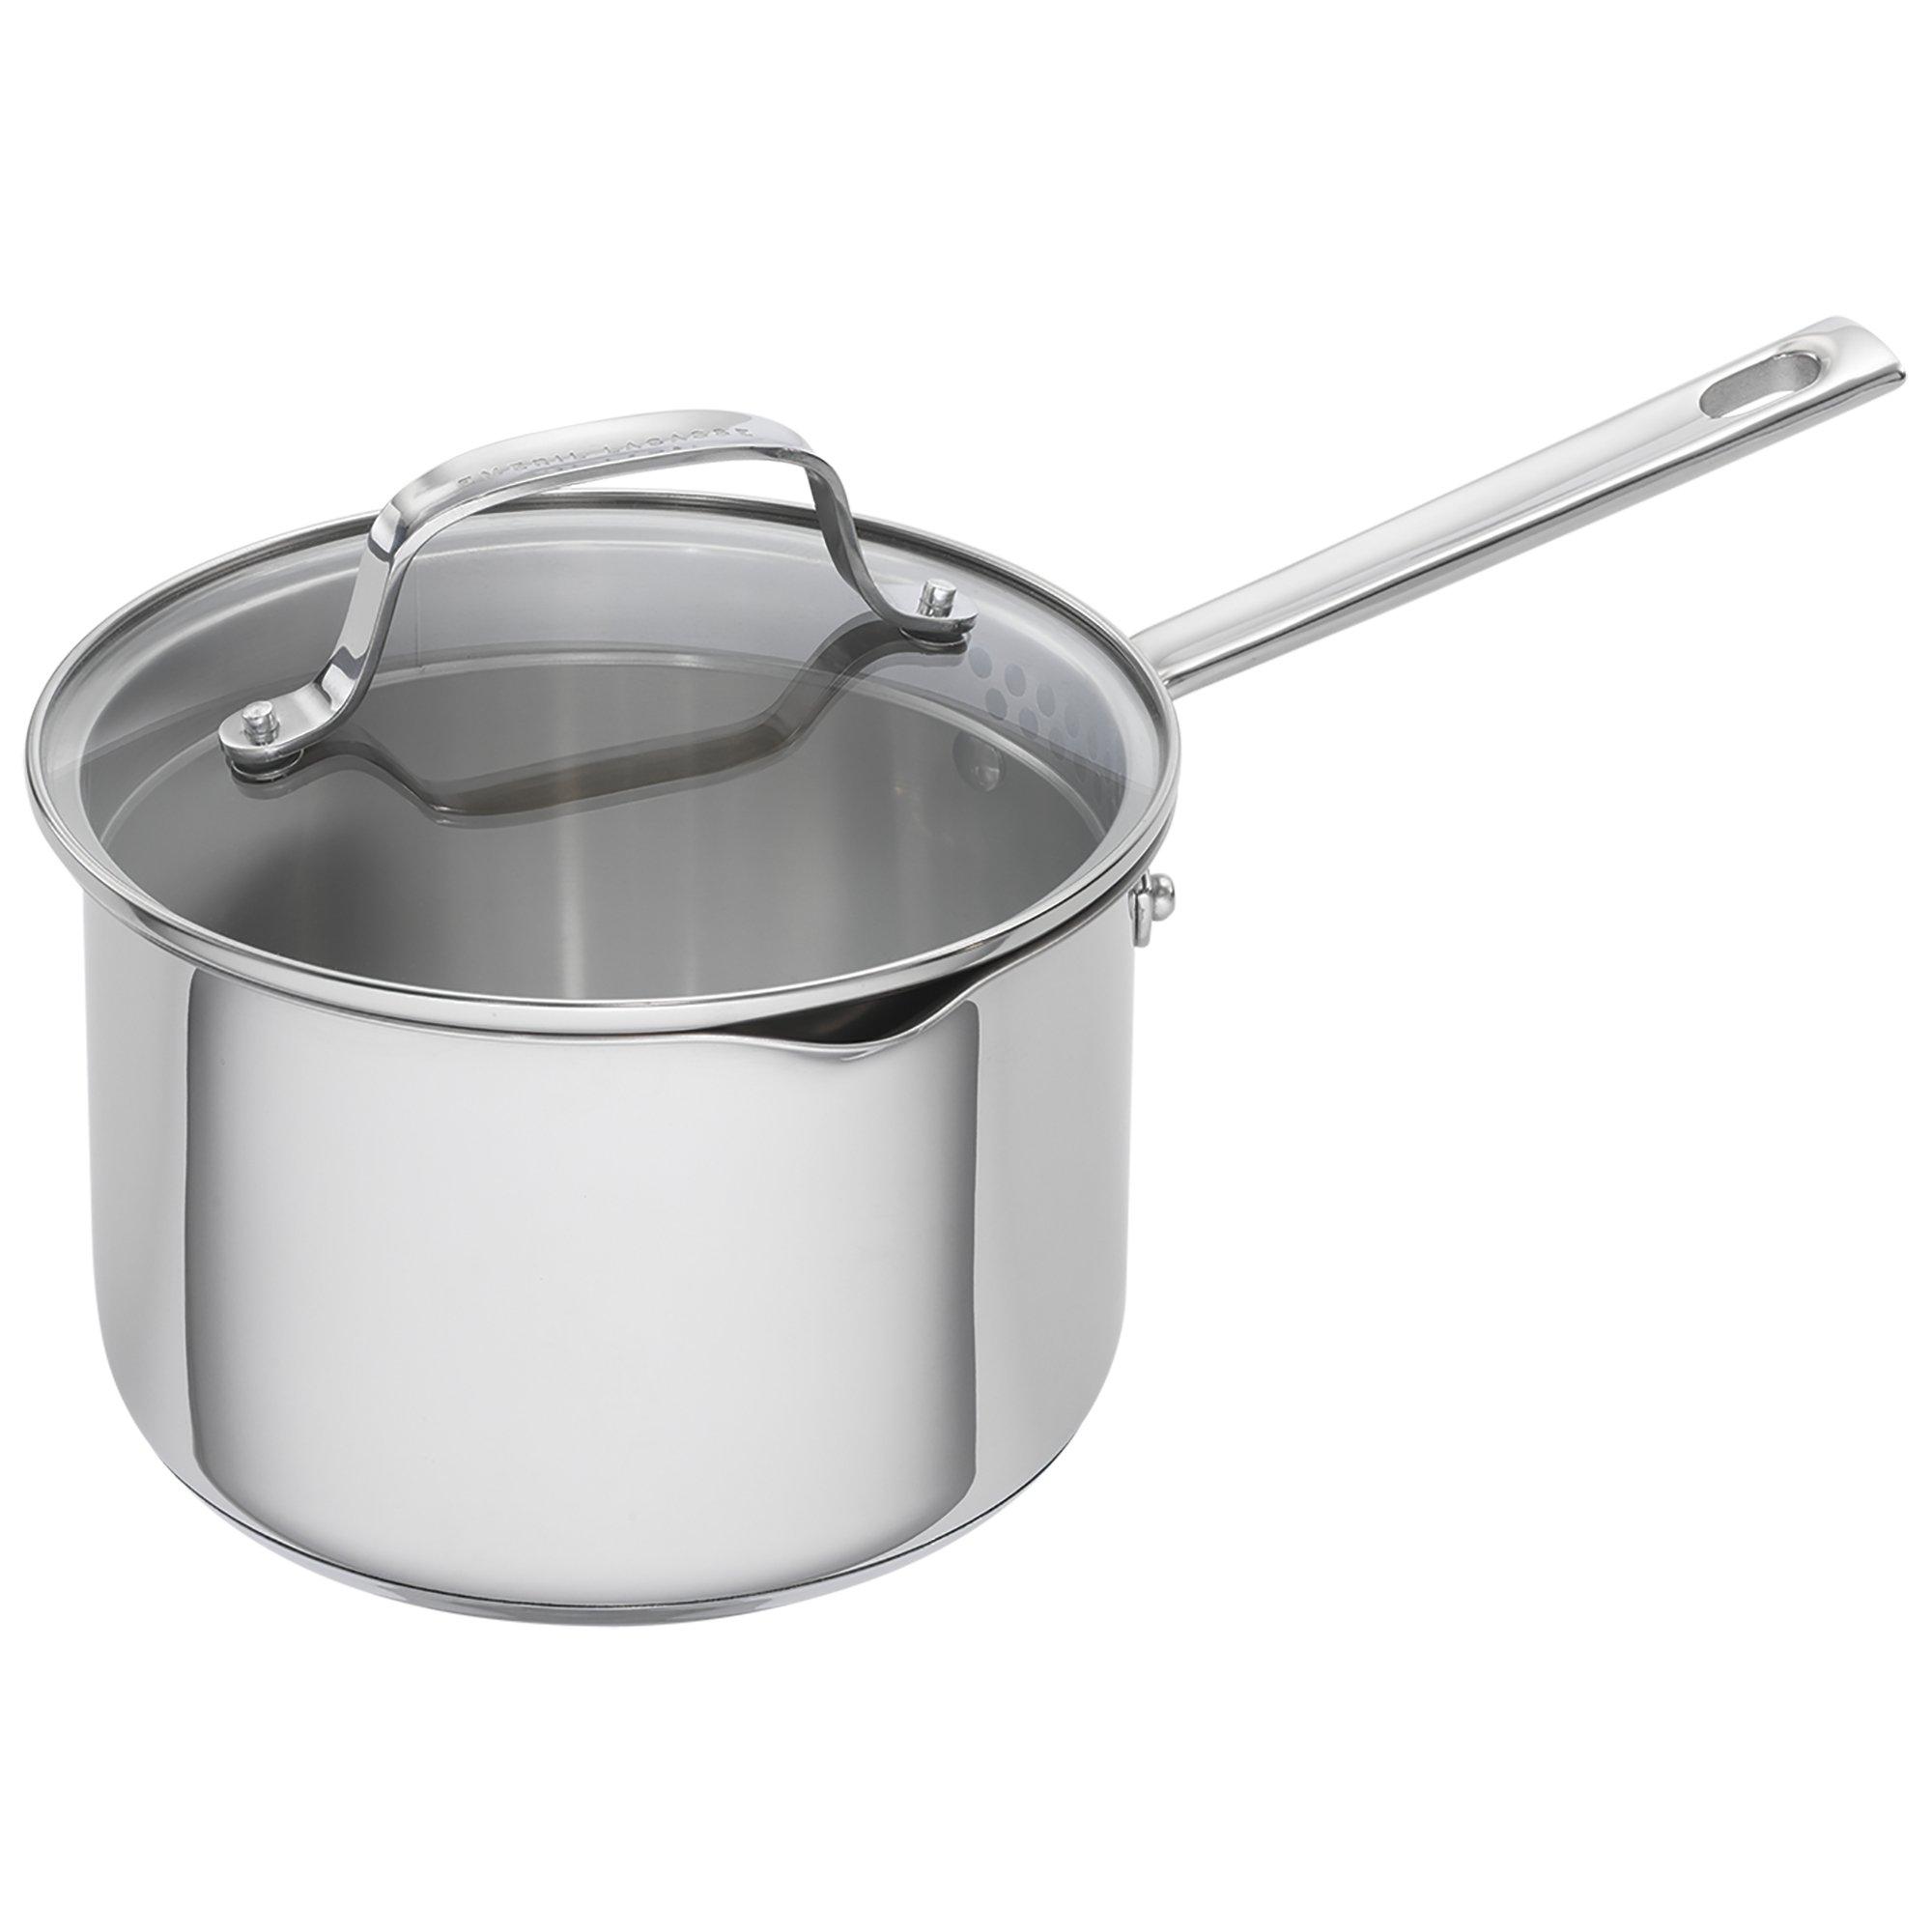 Emeril Lagasse 62956 Stainless Steel Saucepan, 3-Quart, Silver